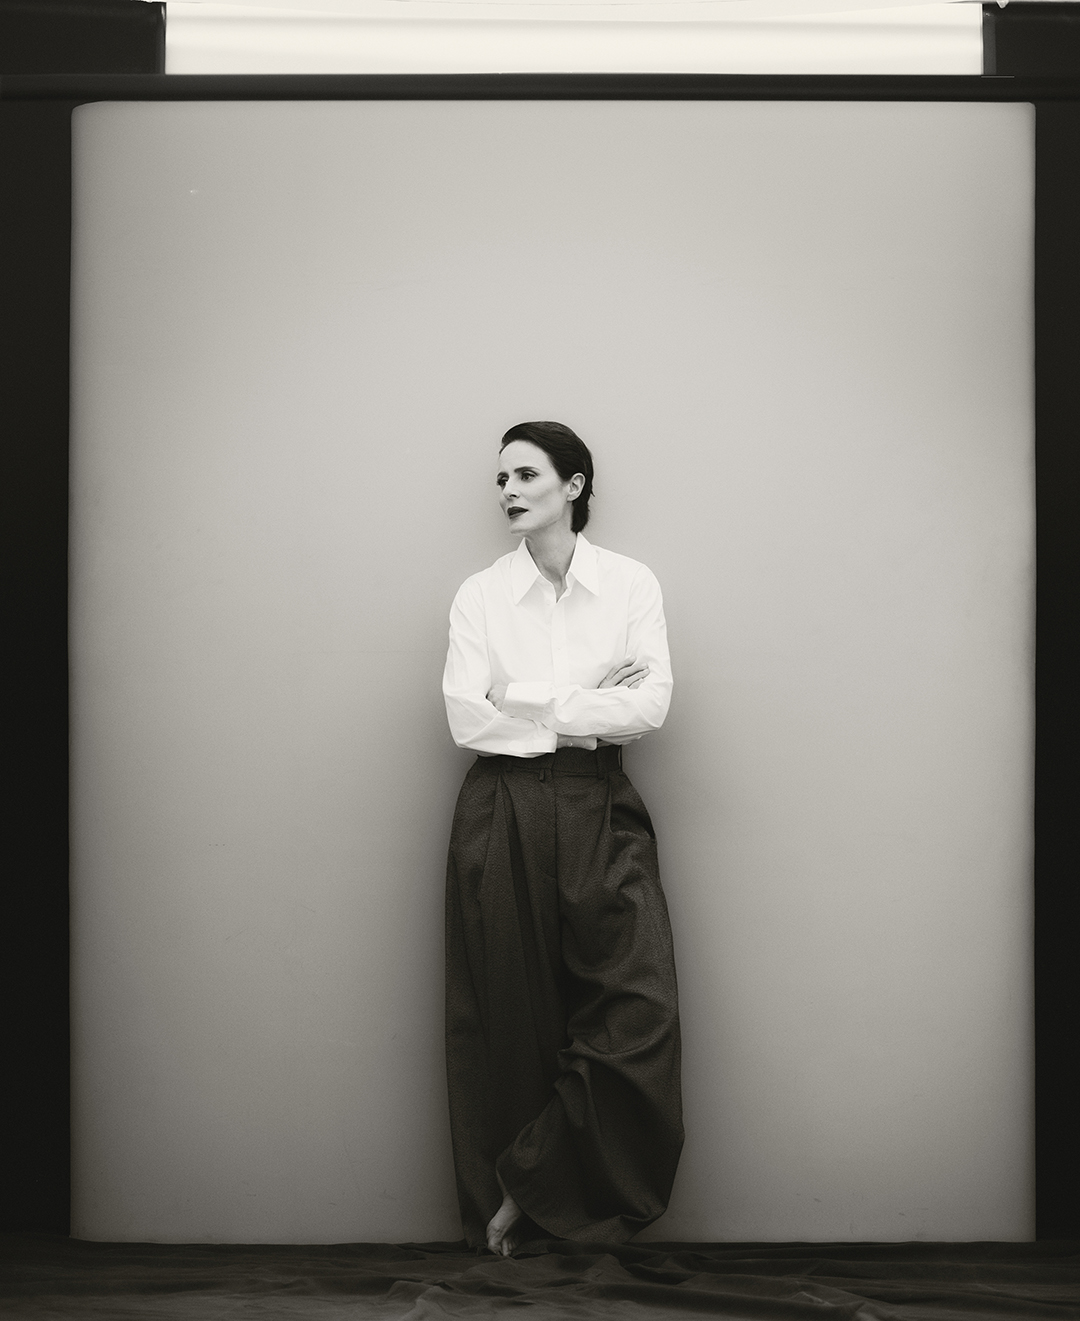 Aitana Sanchez Gijon - Milena Smit - InStyle - InStyle Spain - Francesca Rinciari - Fashion - Editorial - Pedro Almodovar - Madres Paralelas - 8AM - 8 Artist Management